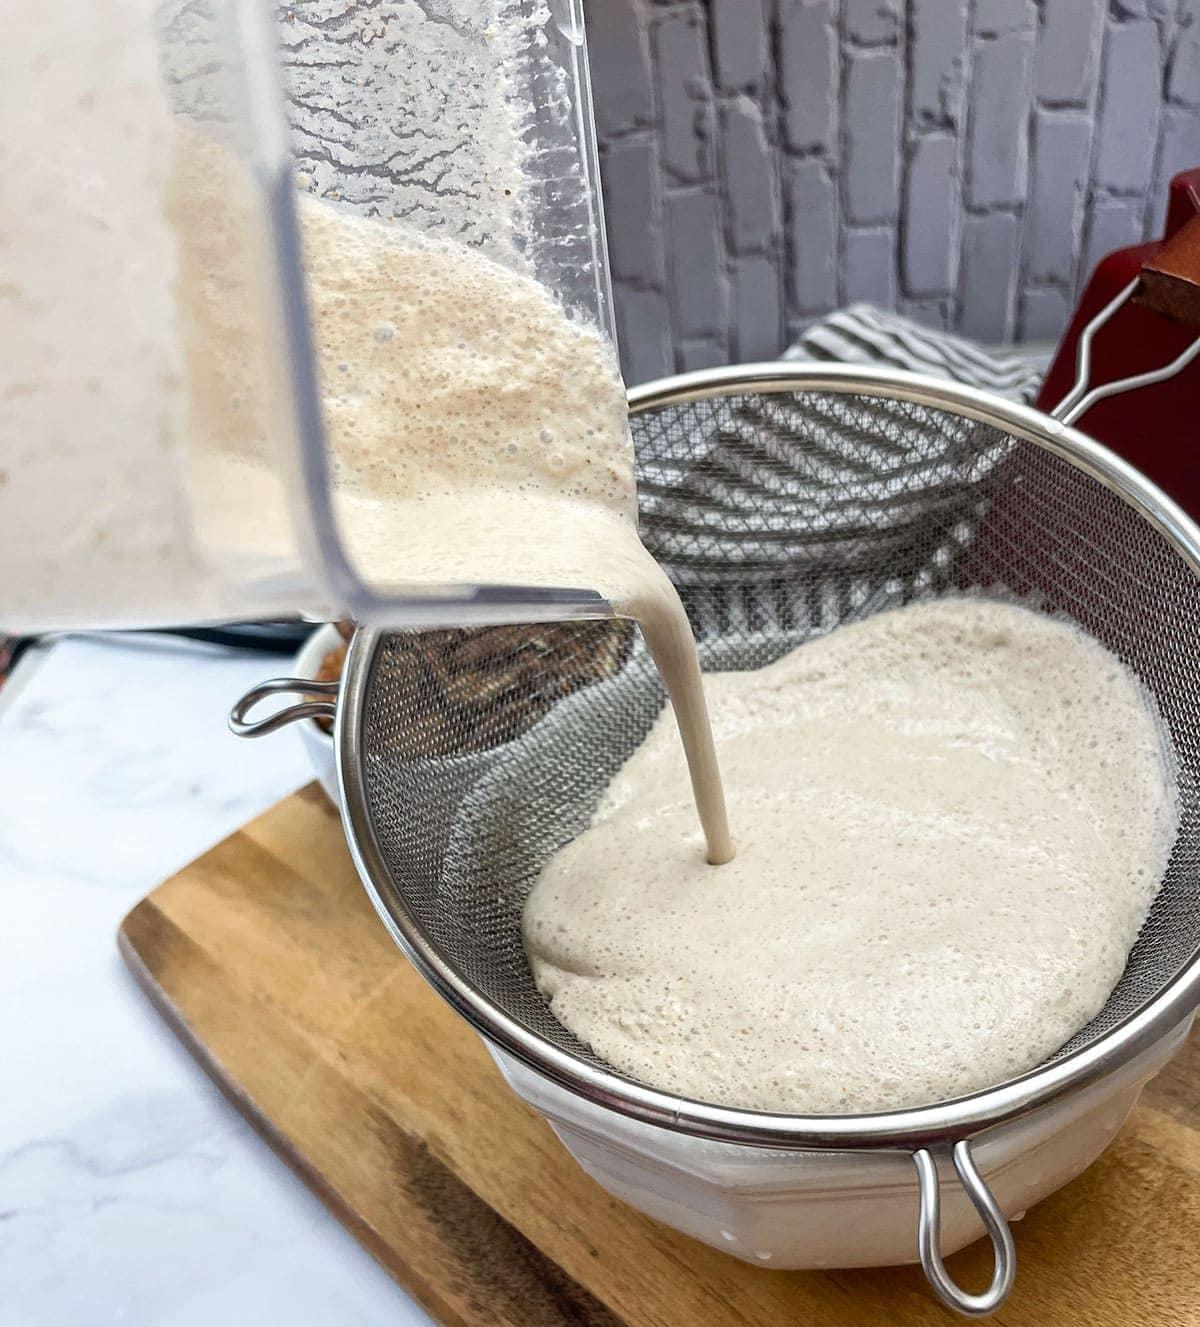 pecan milk being strained